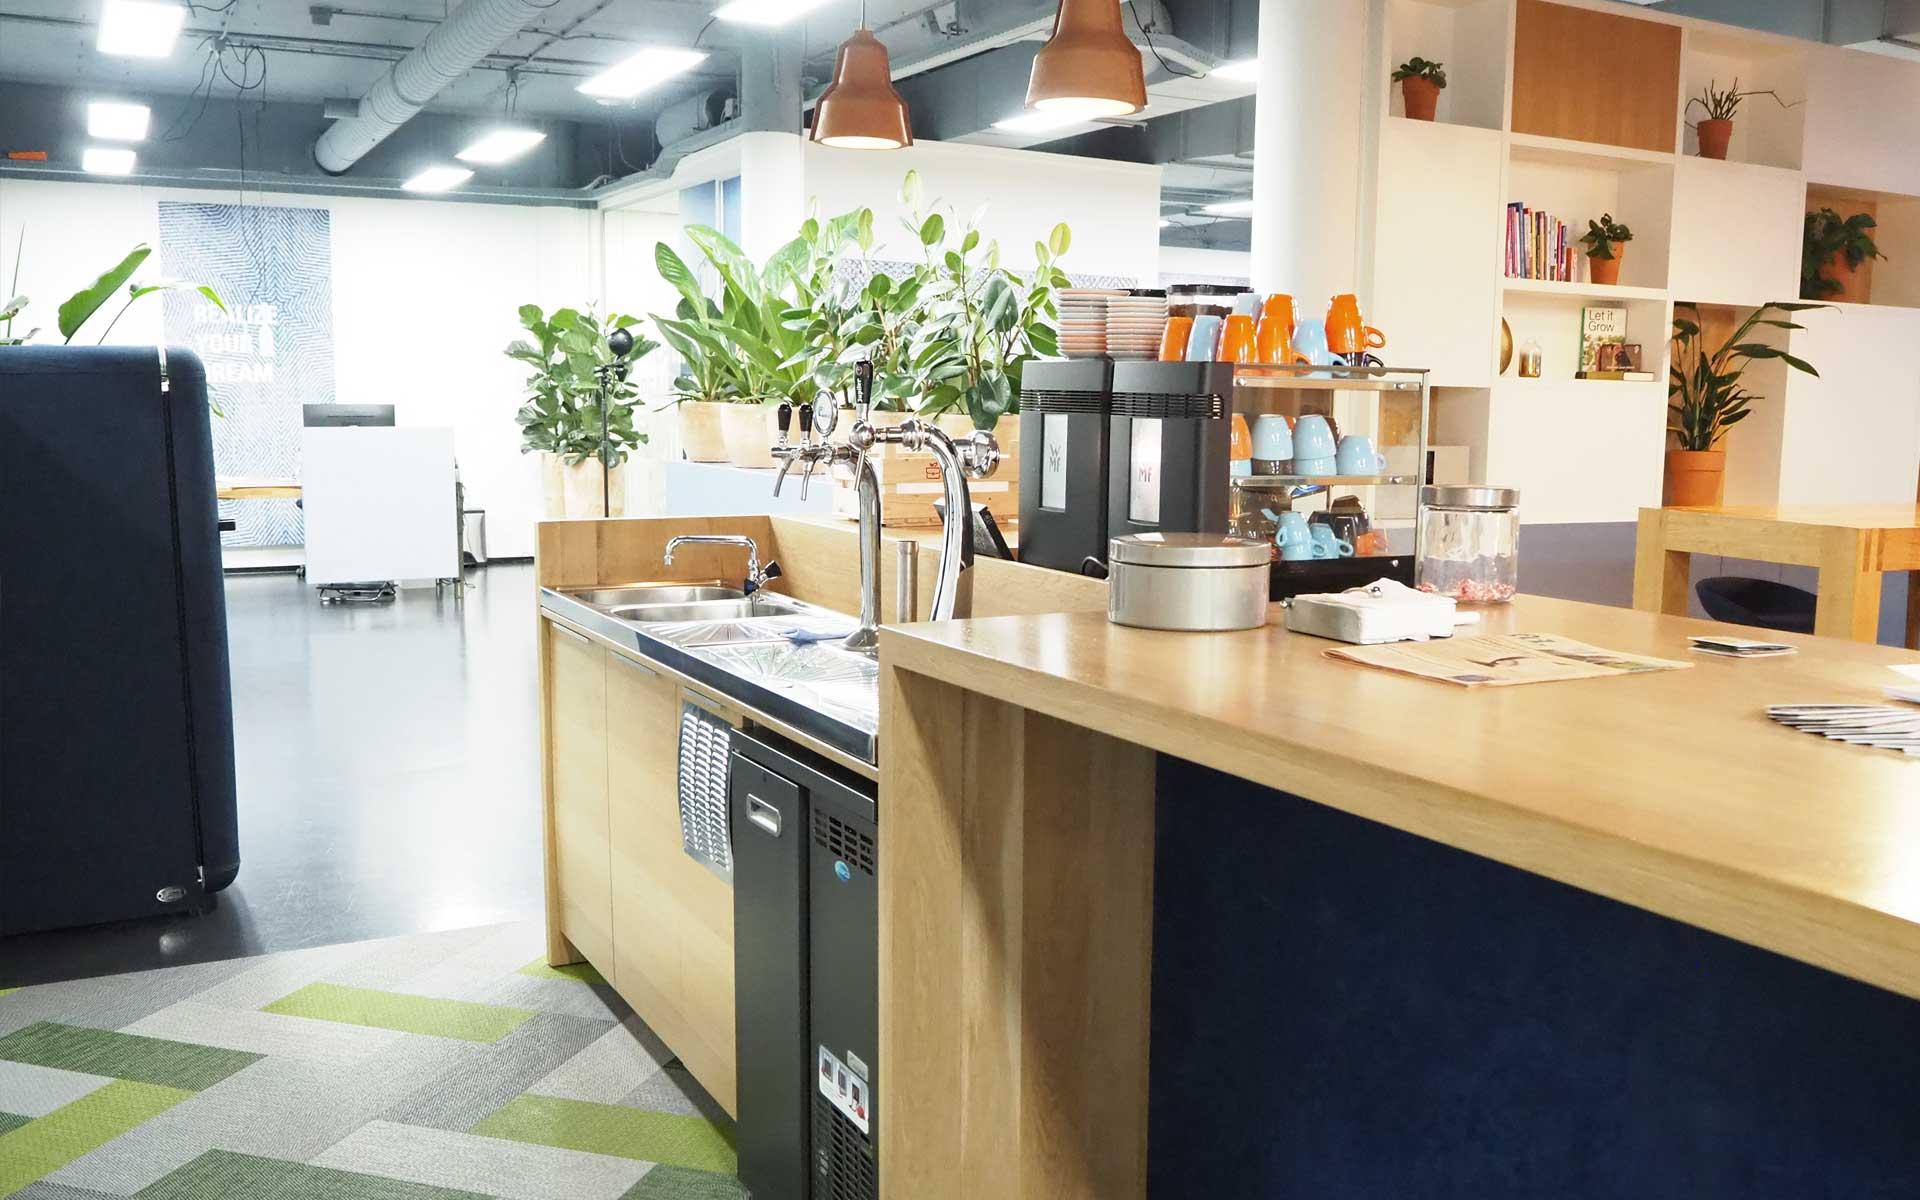 koffiebar-bedrijfstap-biertap-kantooromgeving-clubhuis